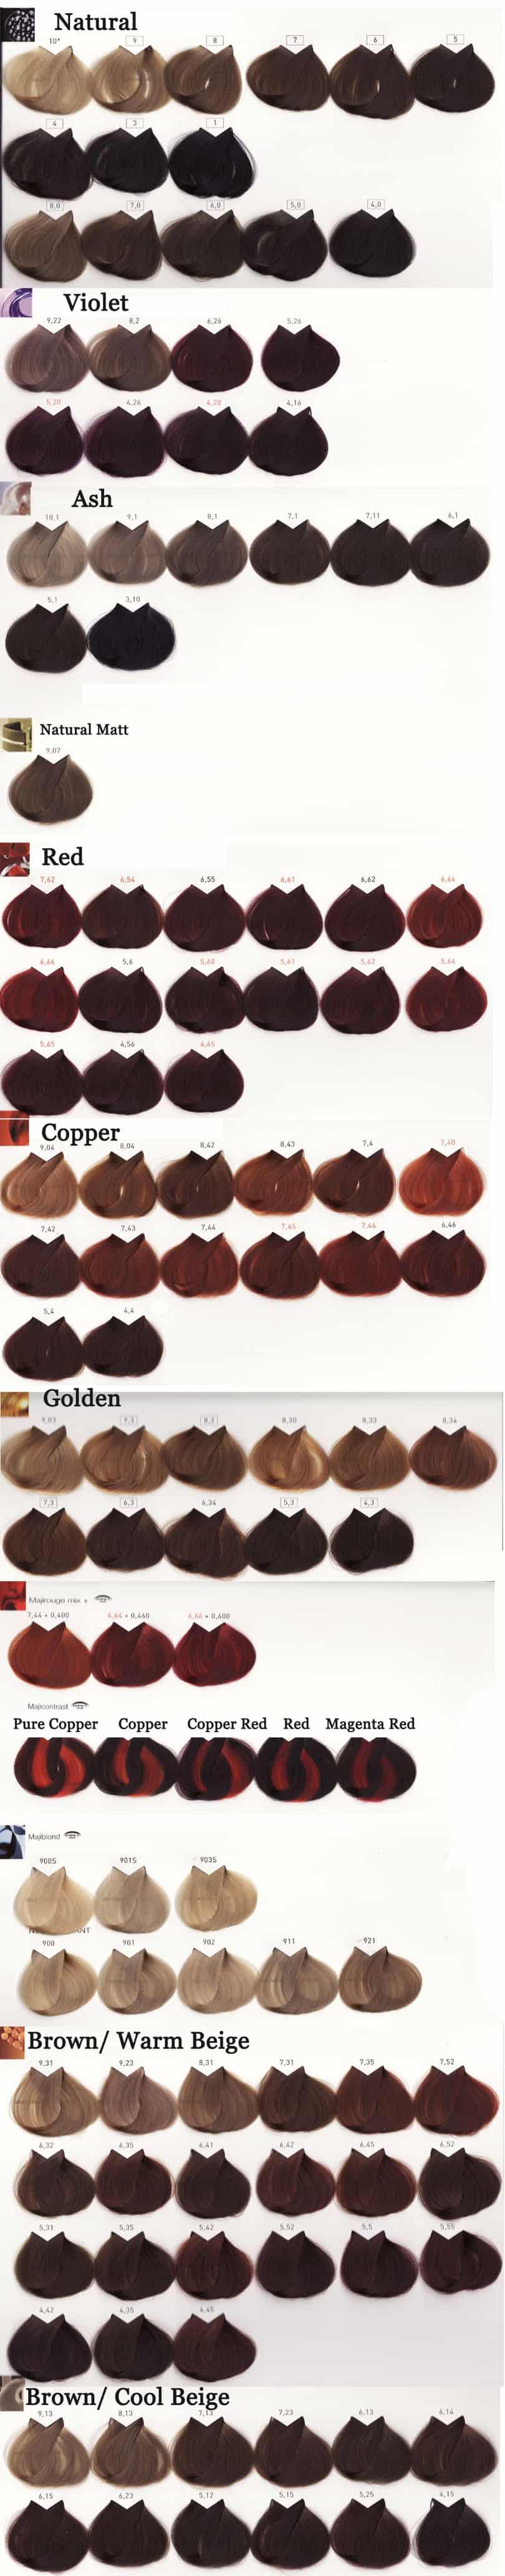 Majirel colour chart - Loreal Majirel Color Chart